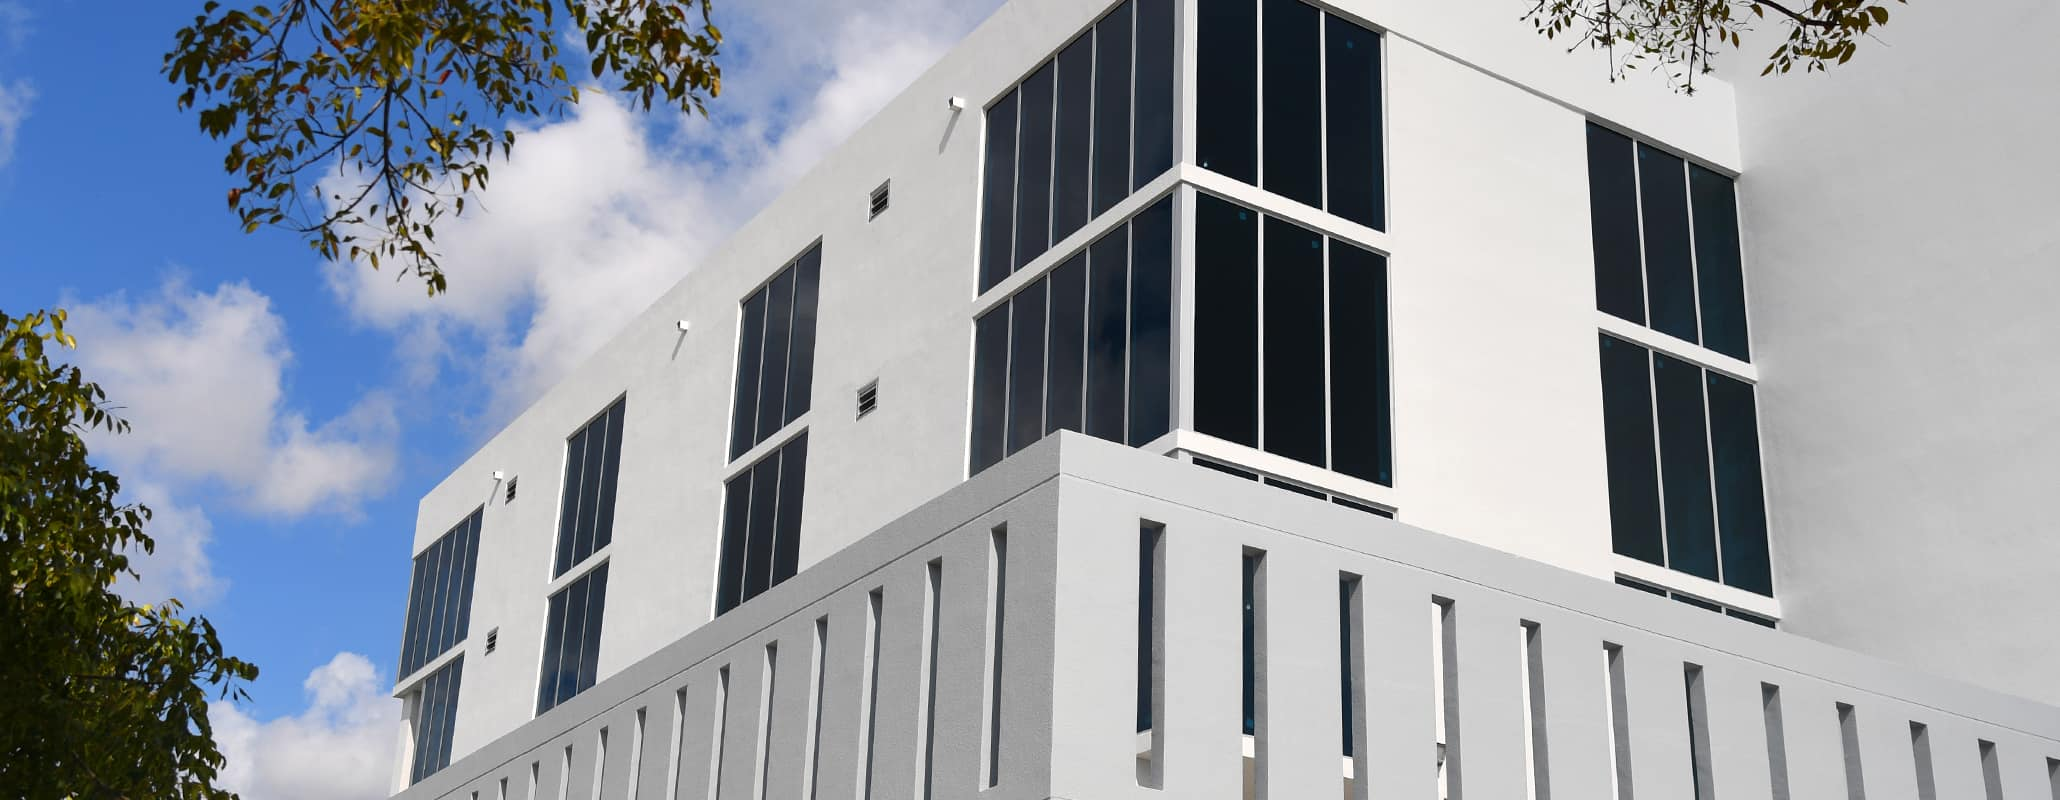 Modern concrete and glass large commercial building, stone balcony, glass curtain wall, RapidGlaze windows by Aldora.